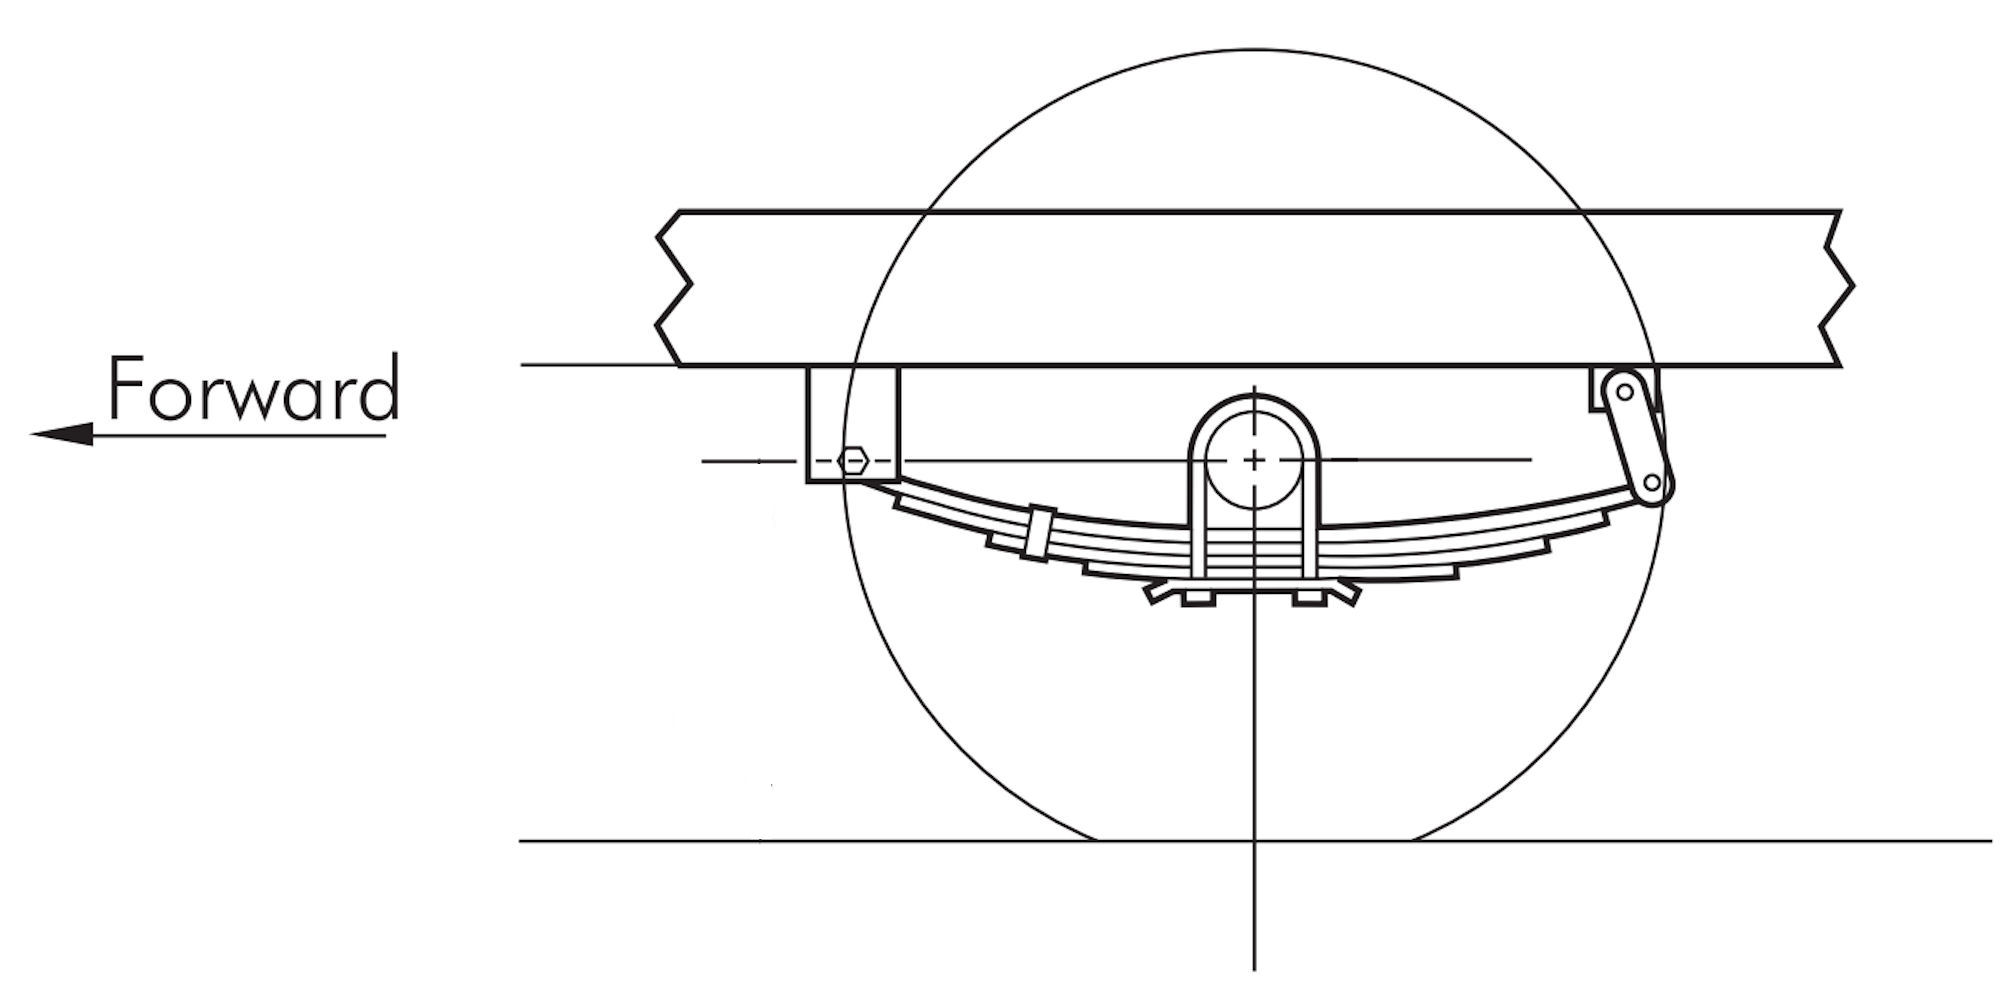 LIBRA Trailer Leaf Spring Hanger Kit for Double Eye Springs Single Axle Suspension